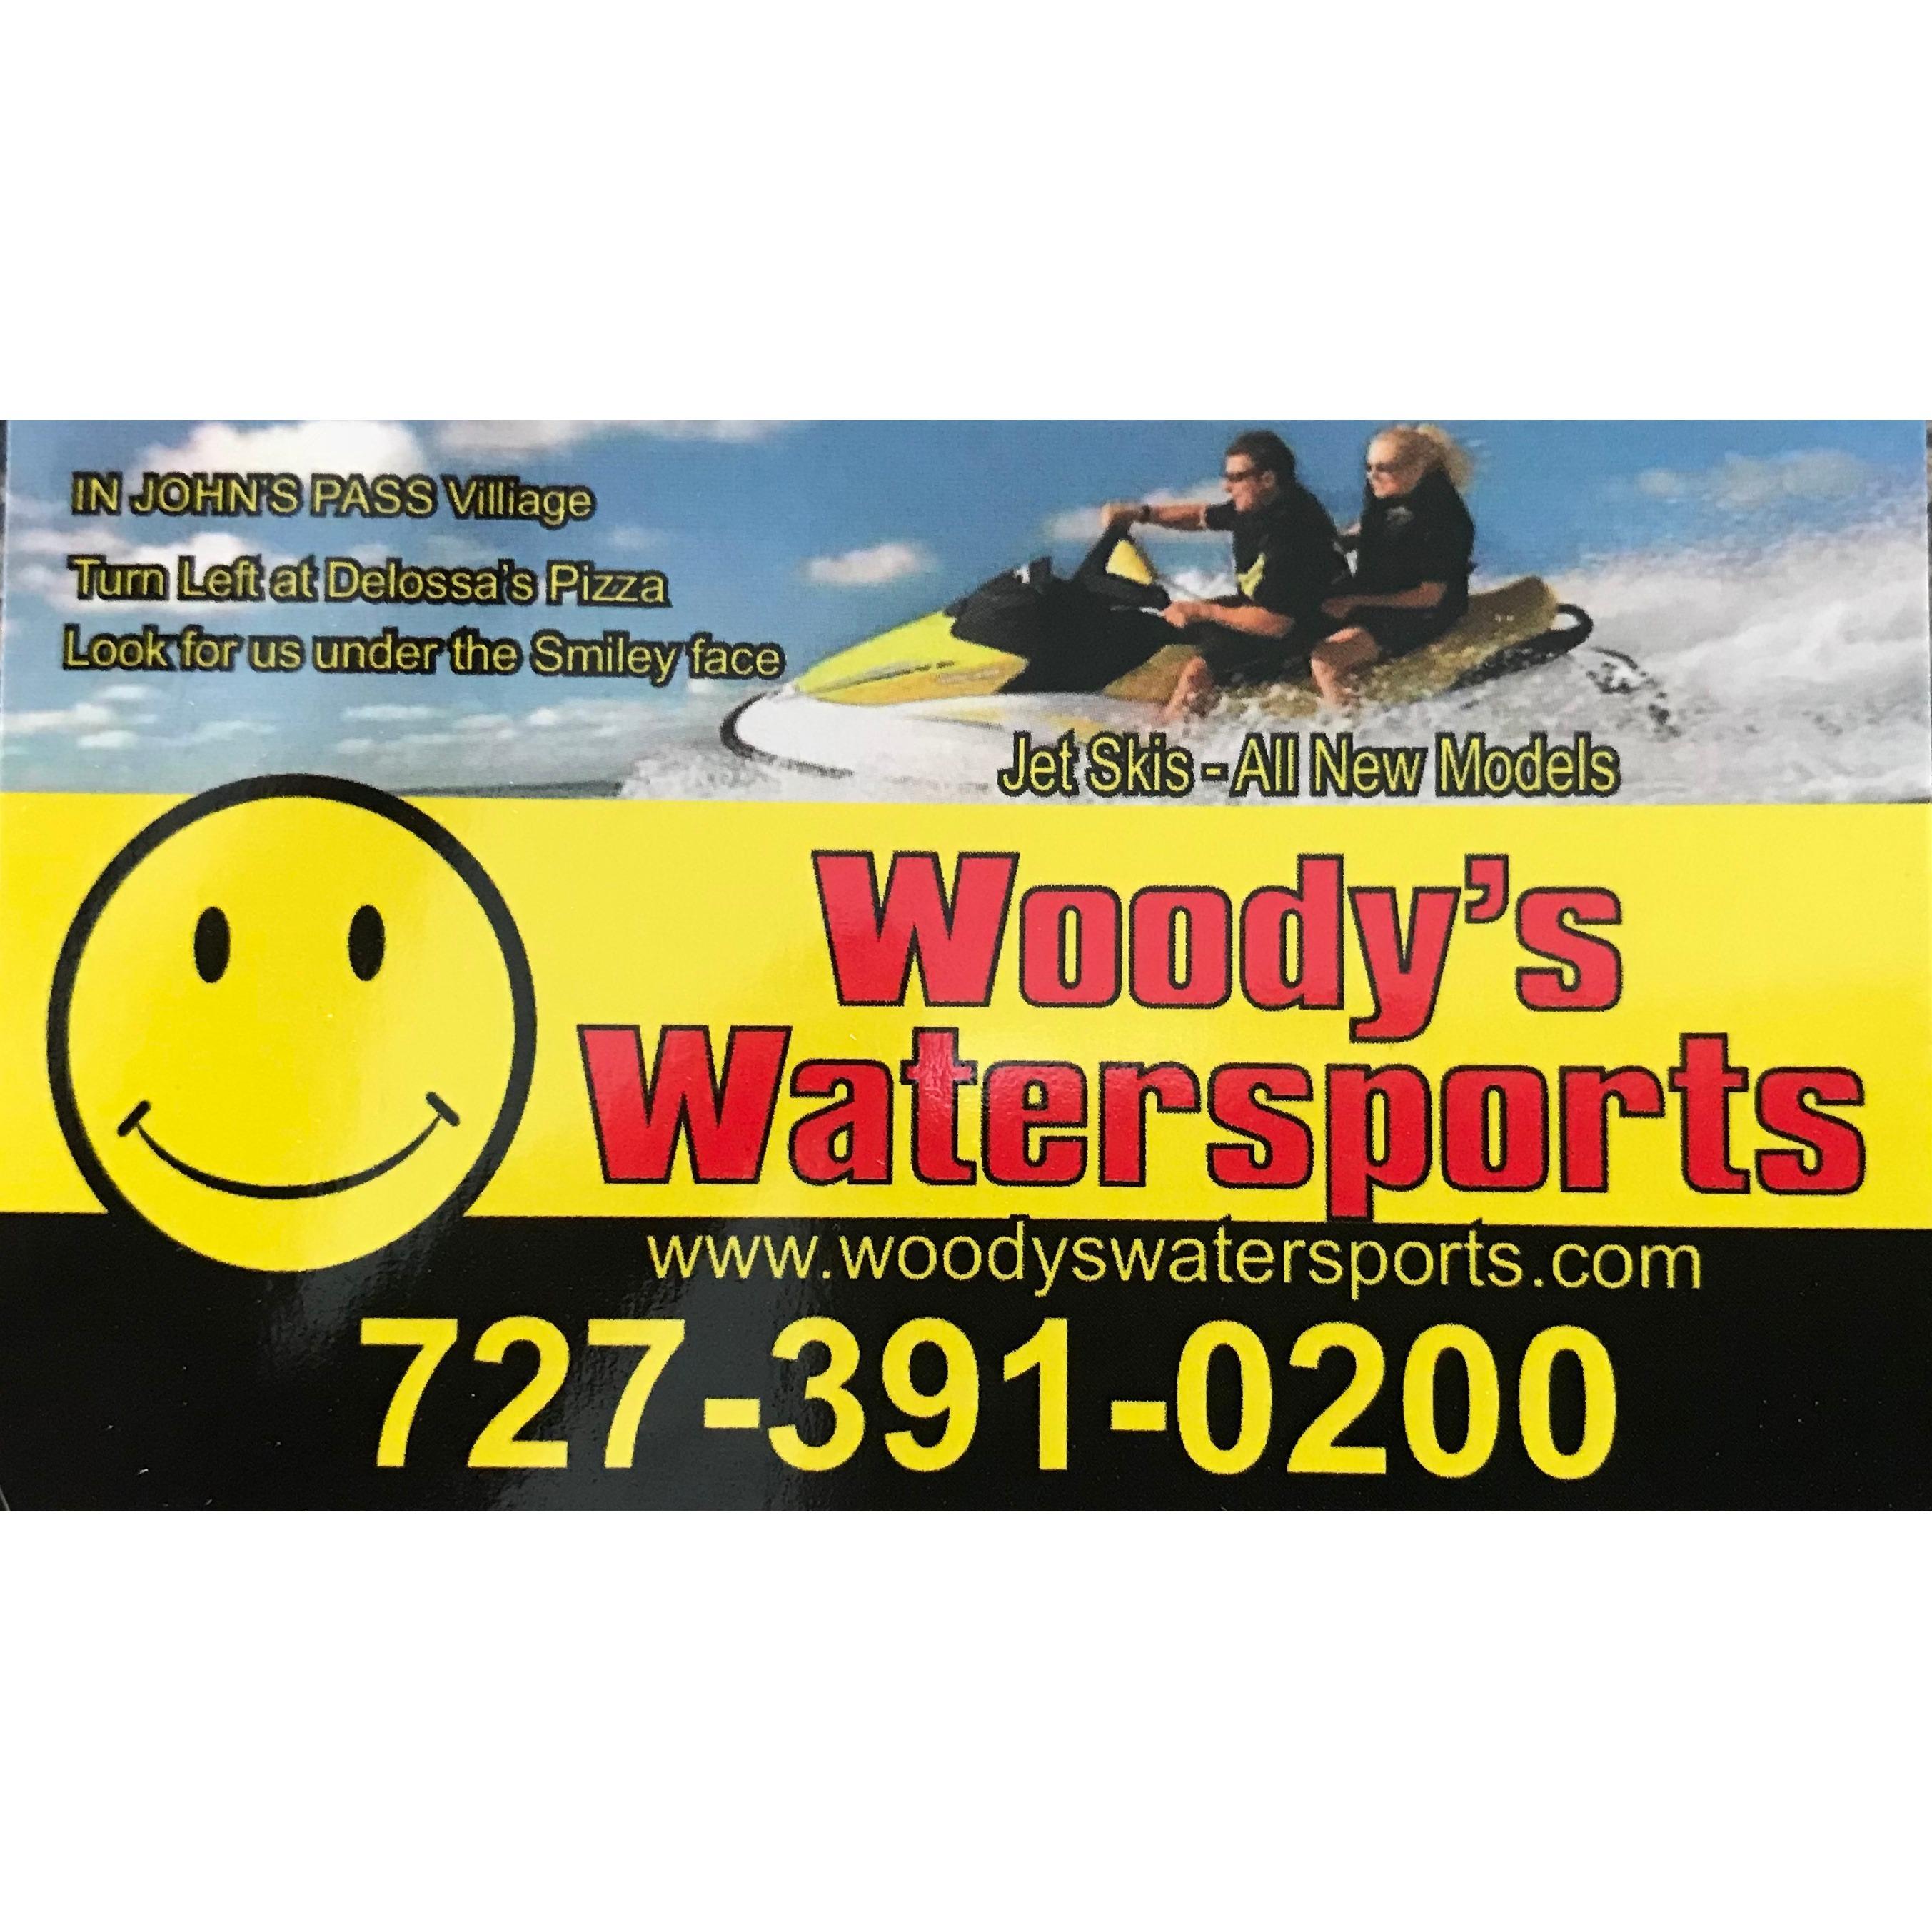 Woody's Watersports LLC image 5